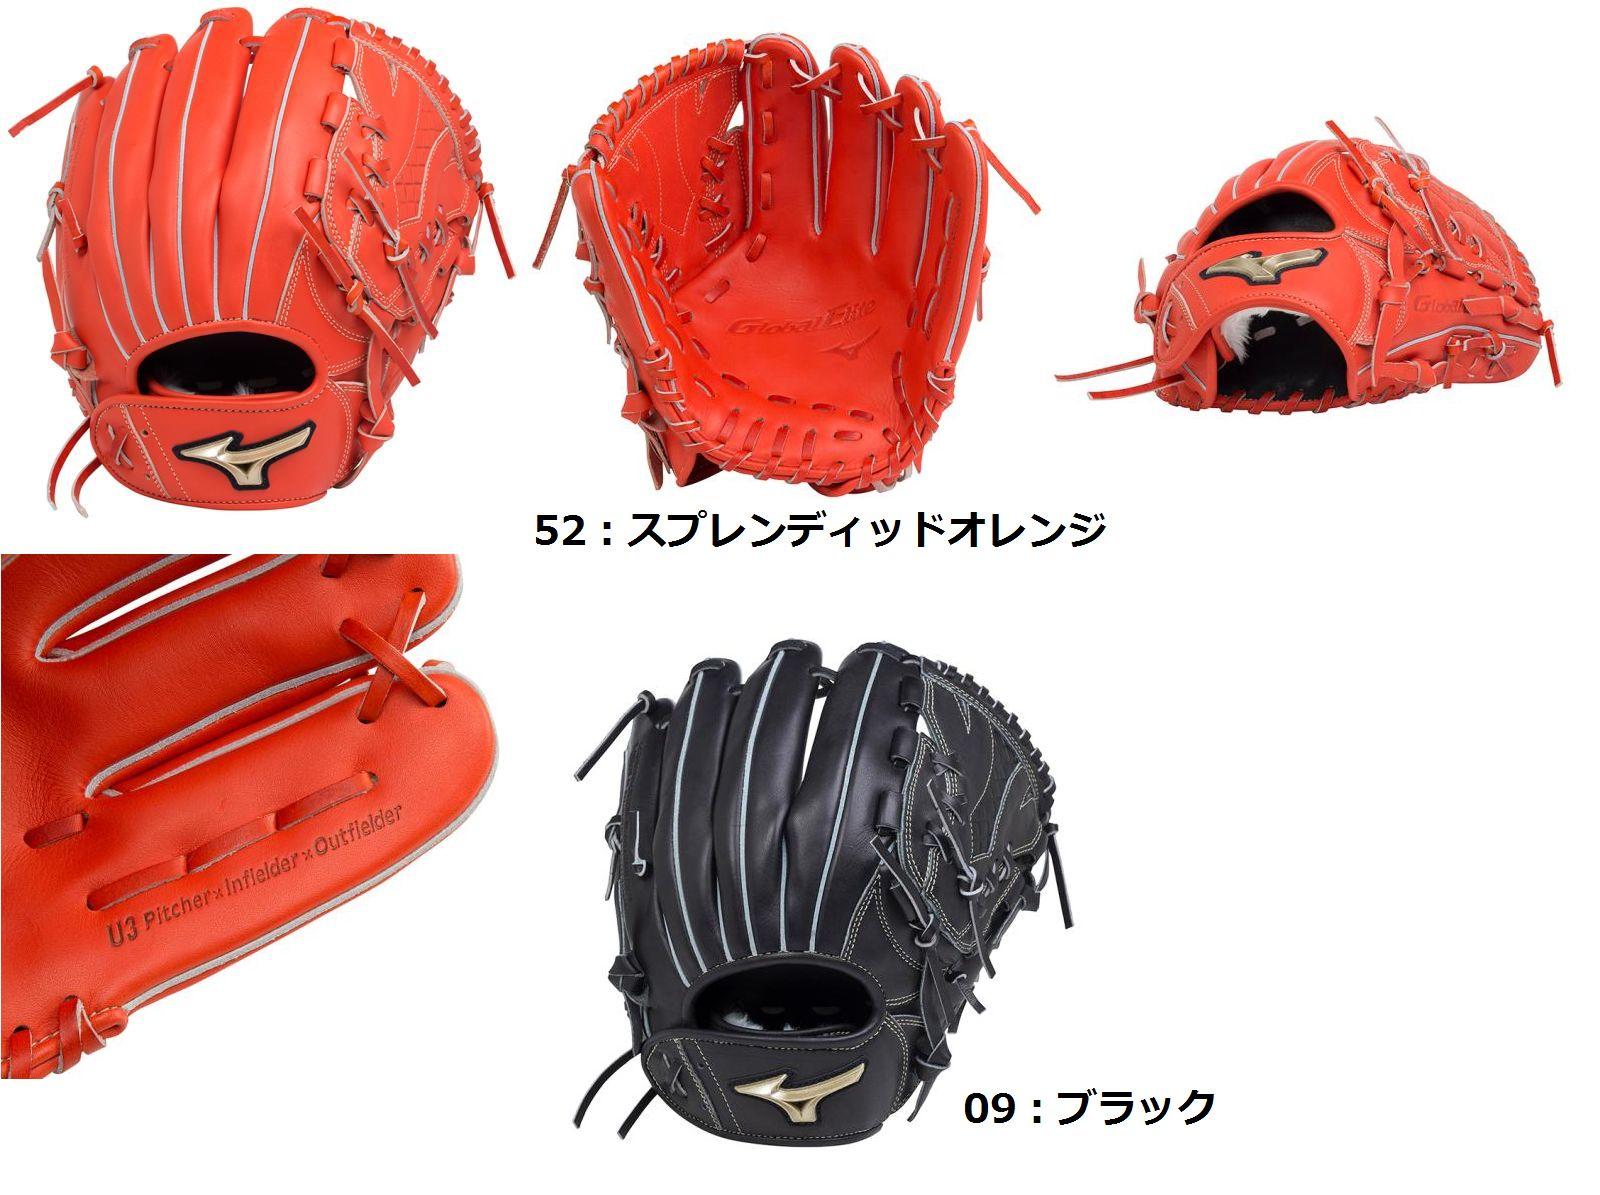 【Mizuno Global Elite~ミズノグローバルエリート】野球一般軟式用グラブ【UMiX】[U3(投手×内野×外野)/サイズ10]【ブラック/スプレンディッドオレンジ】(右投用のみ)一般軟式 中学軟式 高校軟式